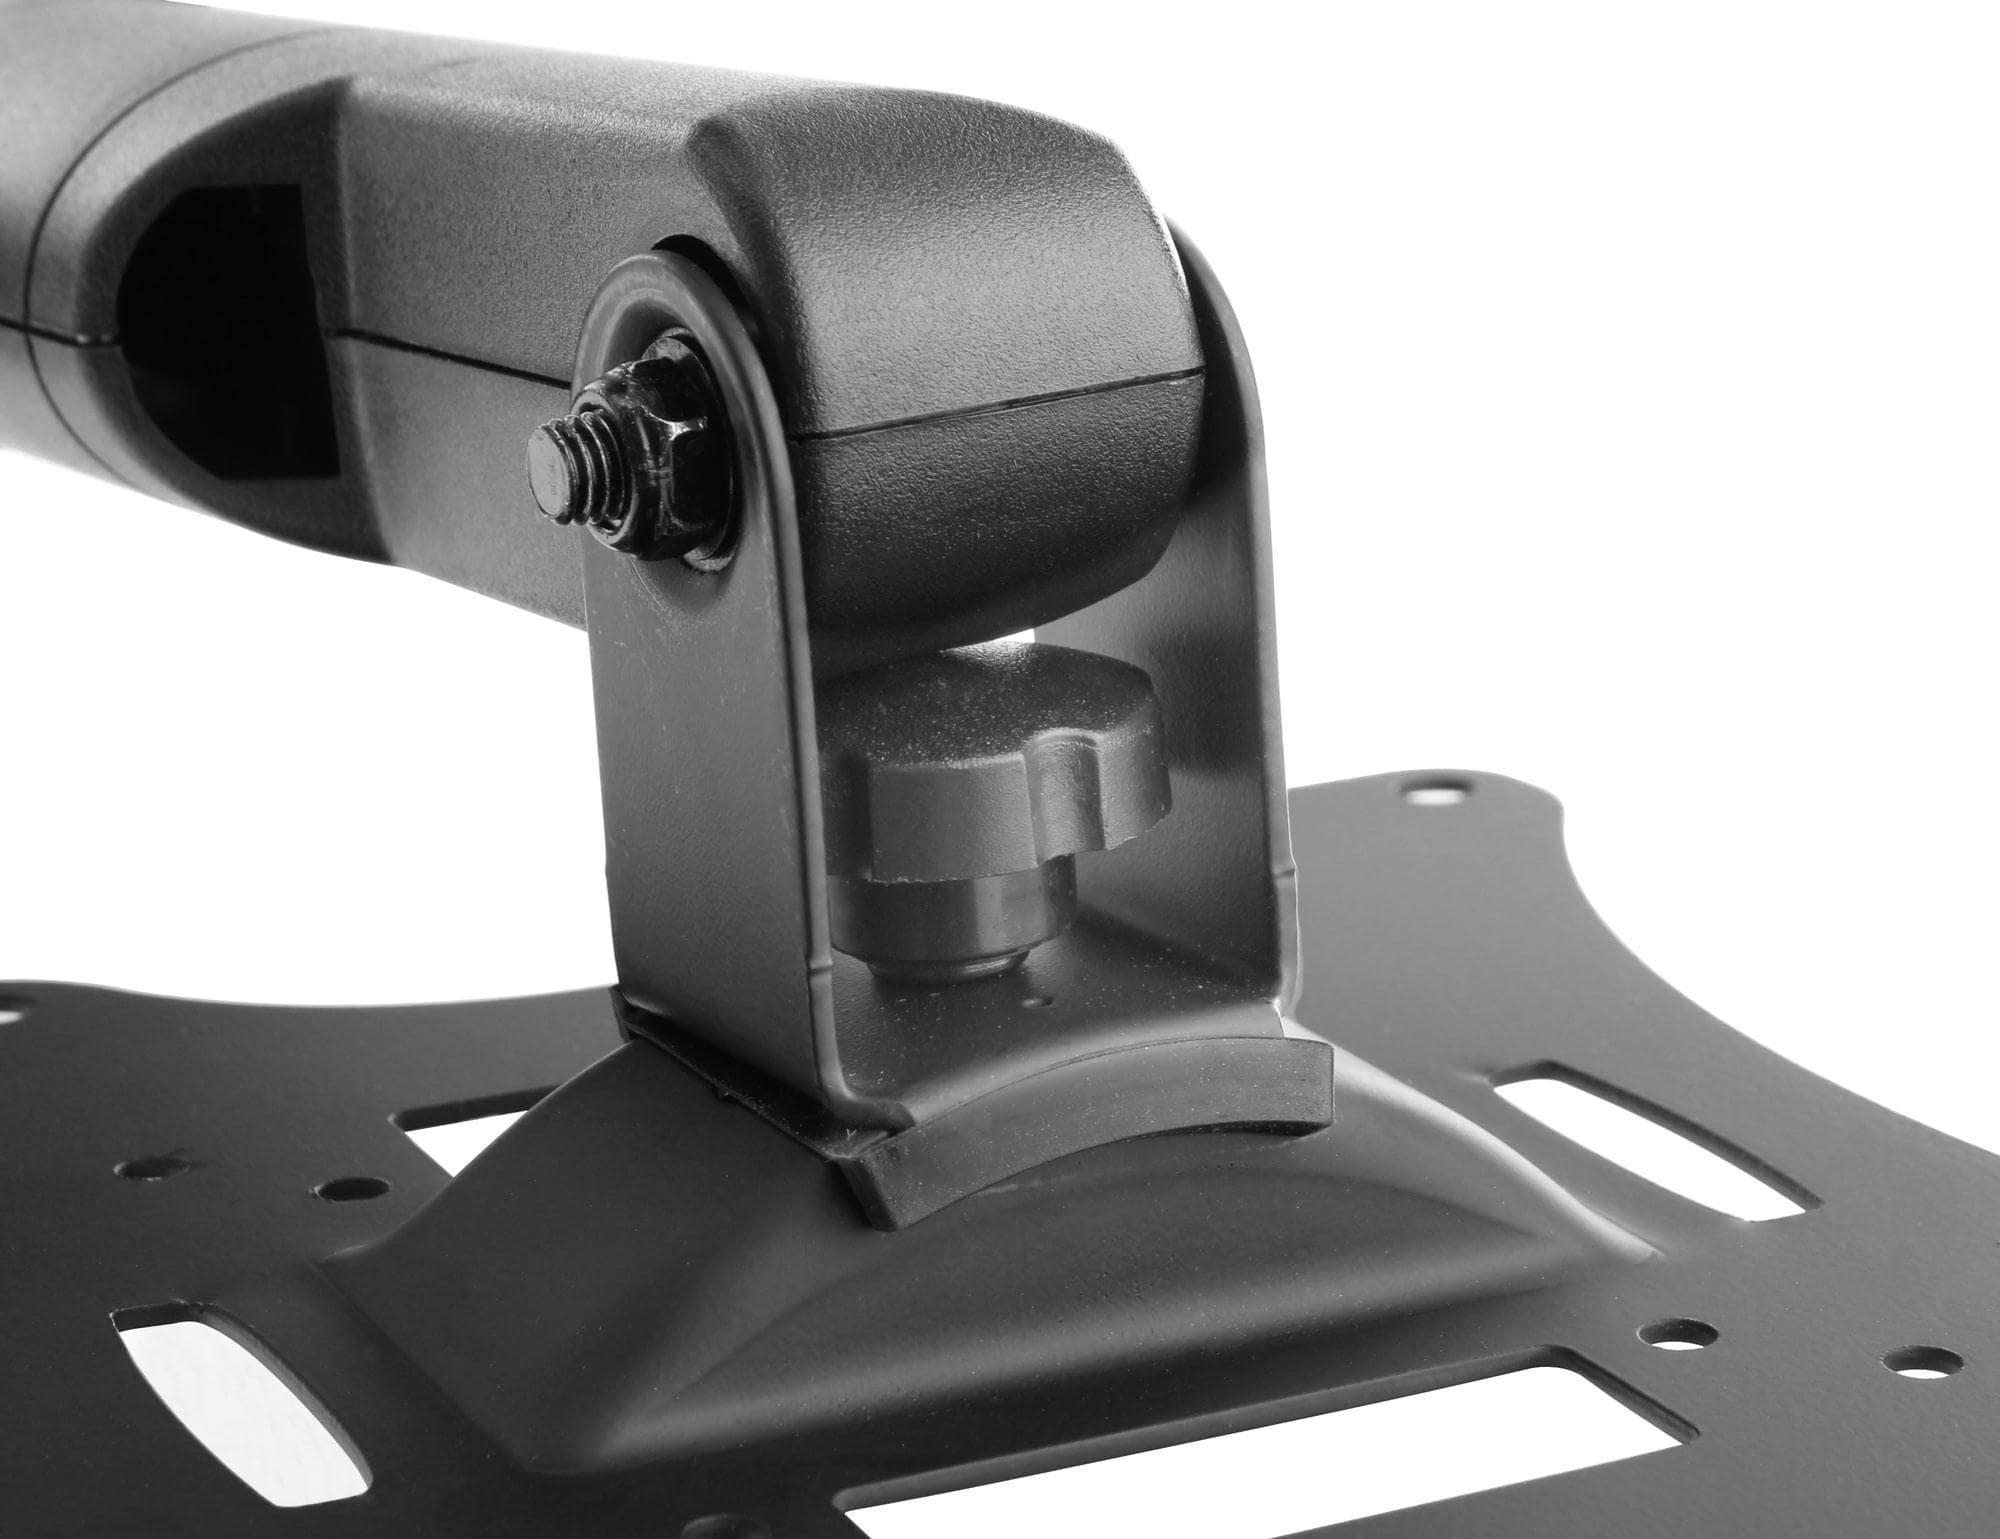 pronomic fpwm 503a schwenkarm wandhalterung f r lcd tv ger te inkl montagematerial. Black Bedroom Furniture Sets. Home Design Ideas